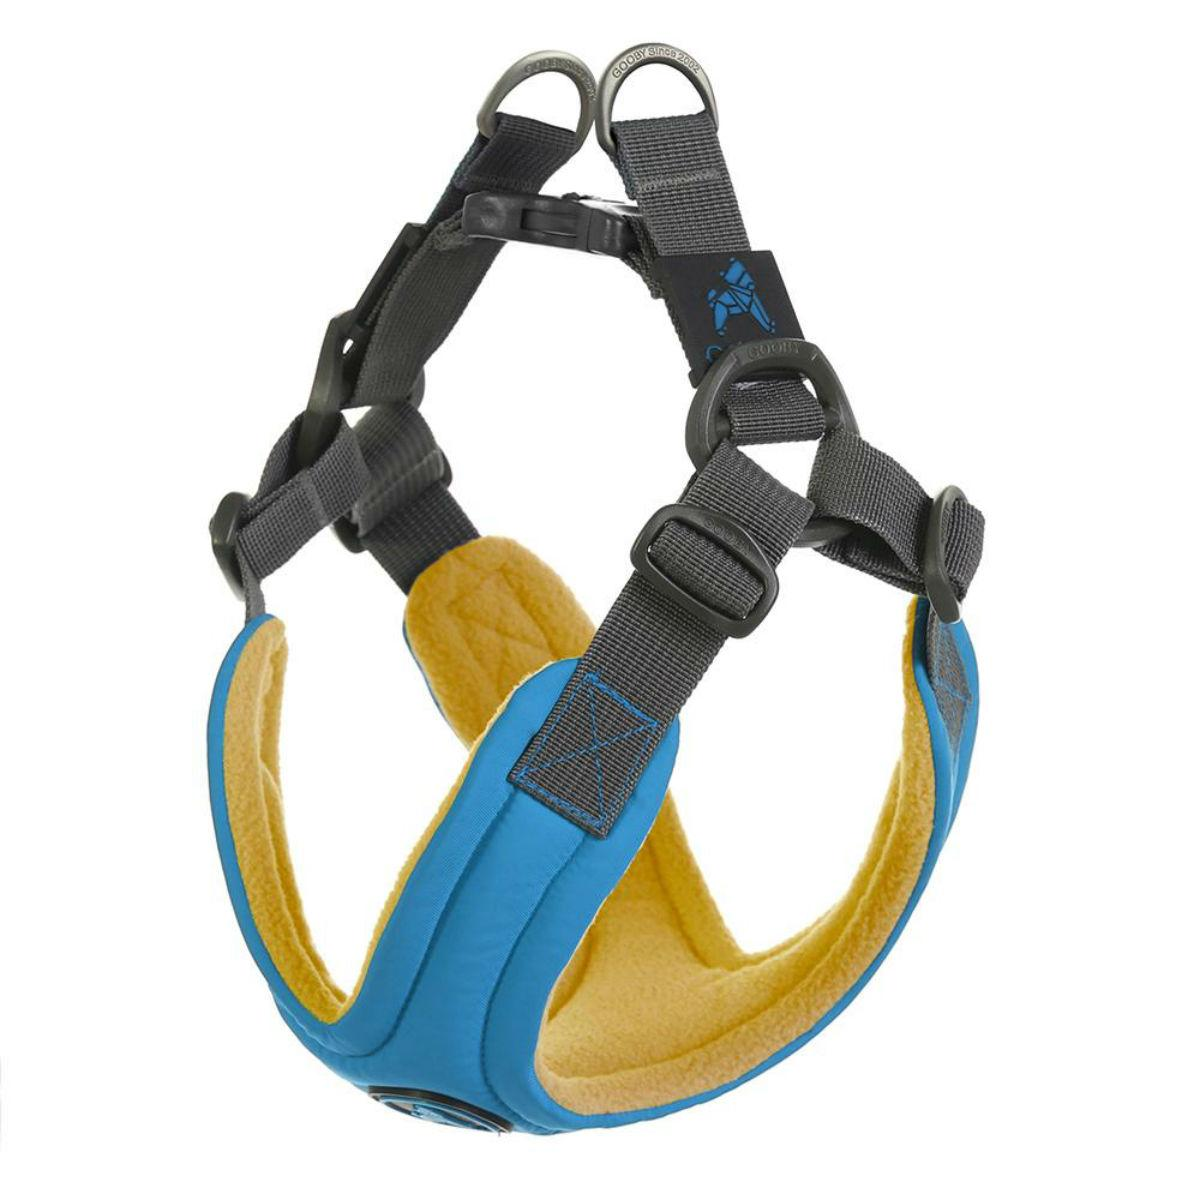 Gooby Escape Free Memory Foam Dog Harness - Blue